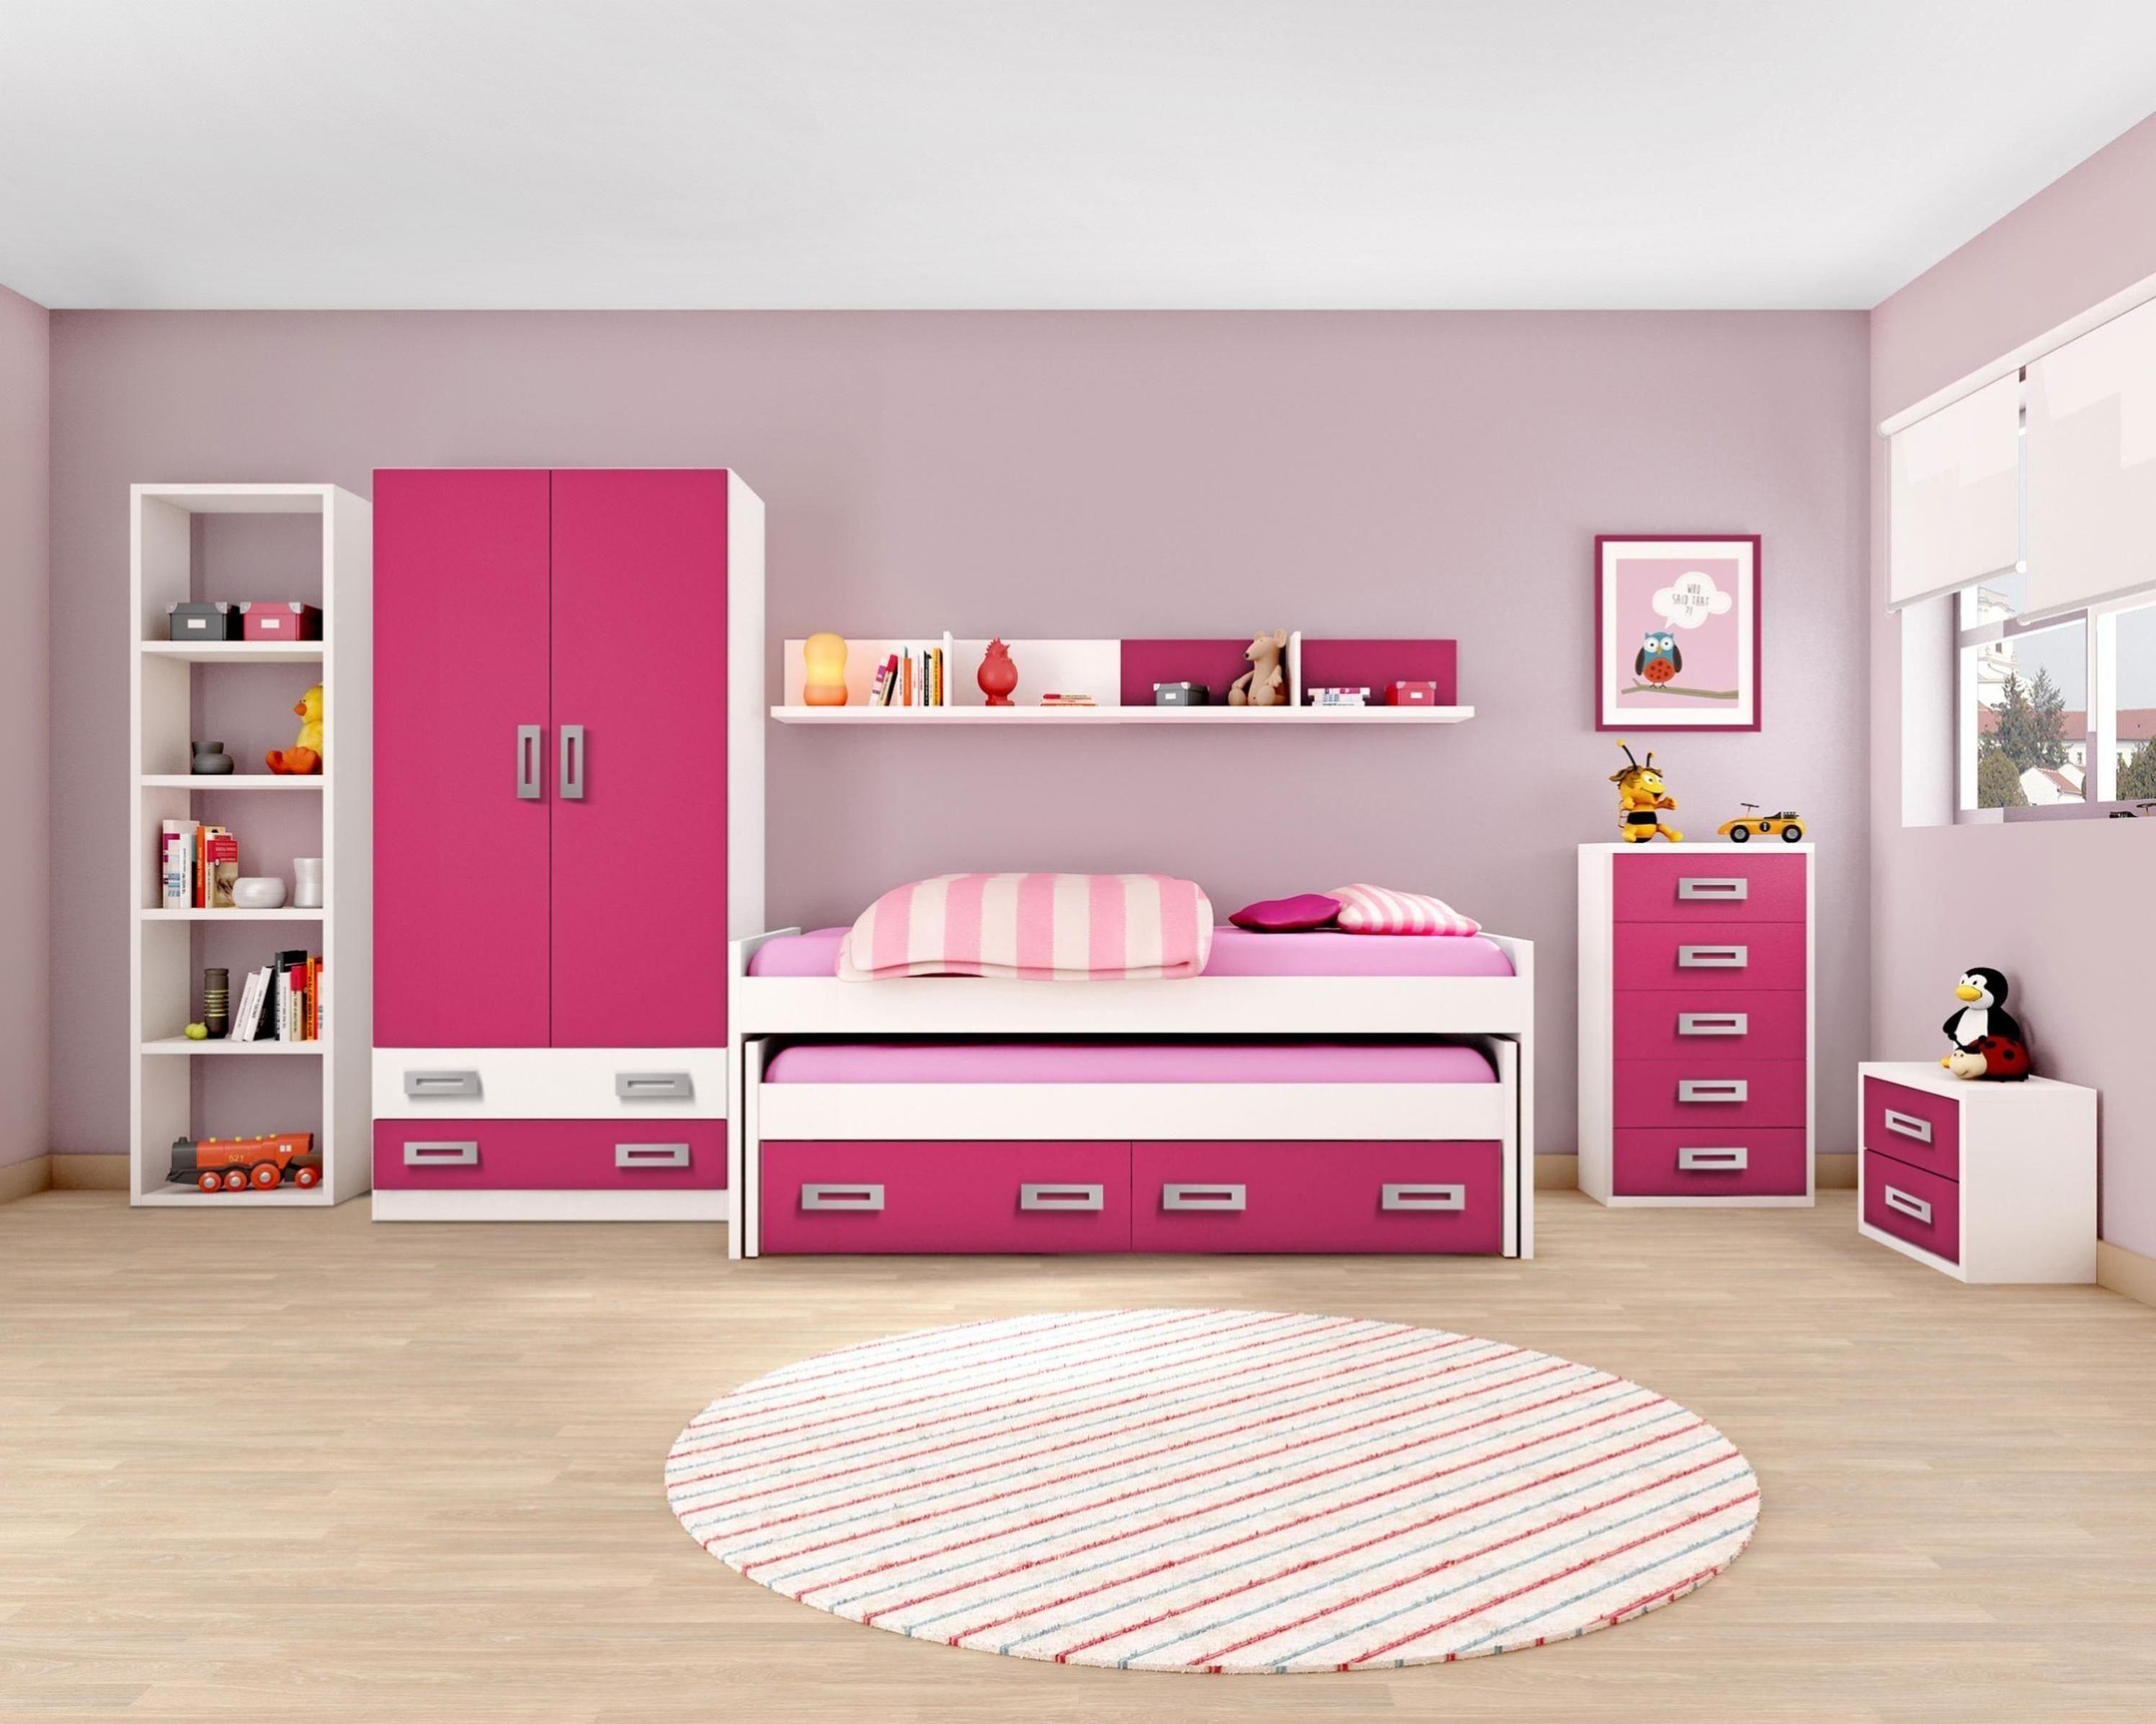 Muebles juveniles dormitorios obtenga ideas dise o de for Muebles juveniles baratos